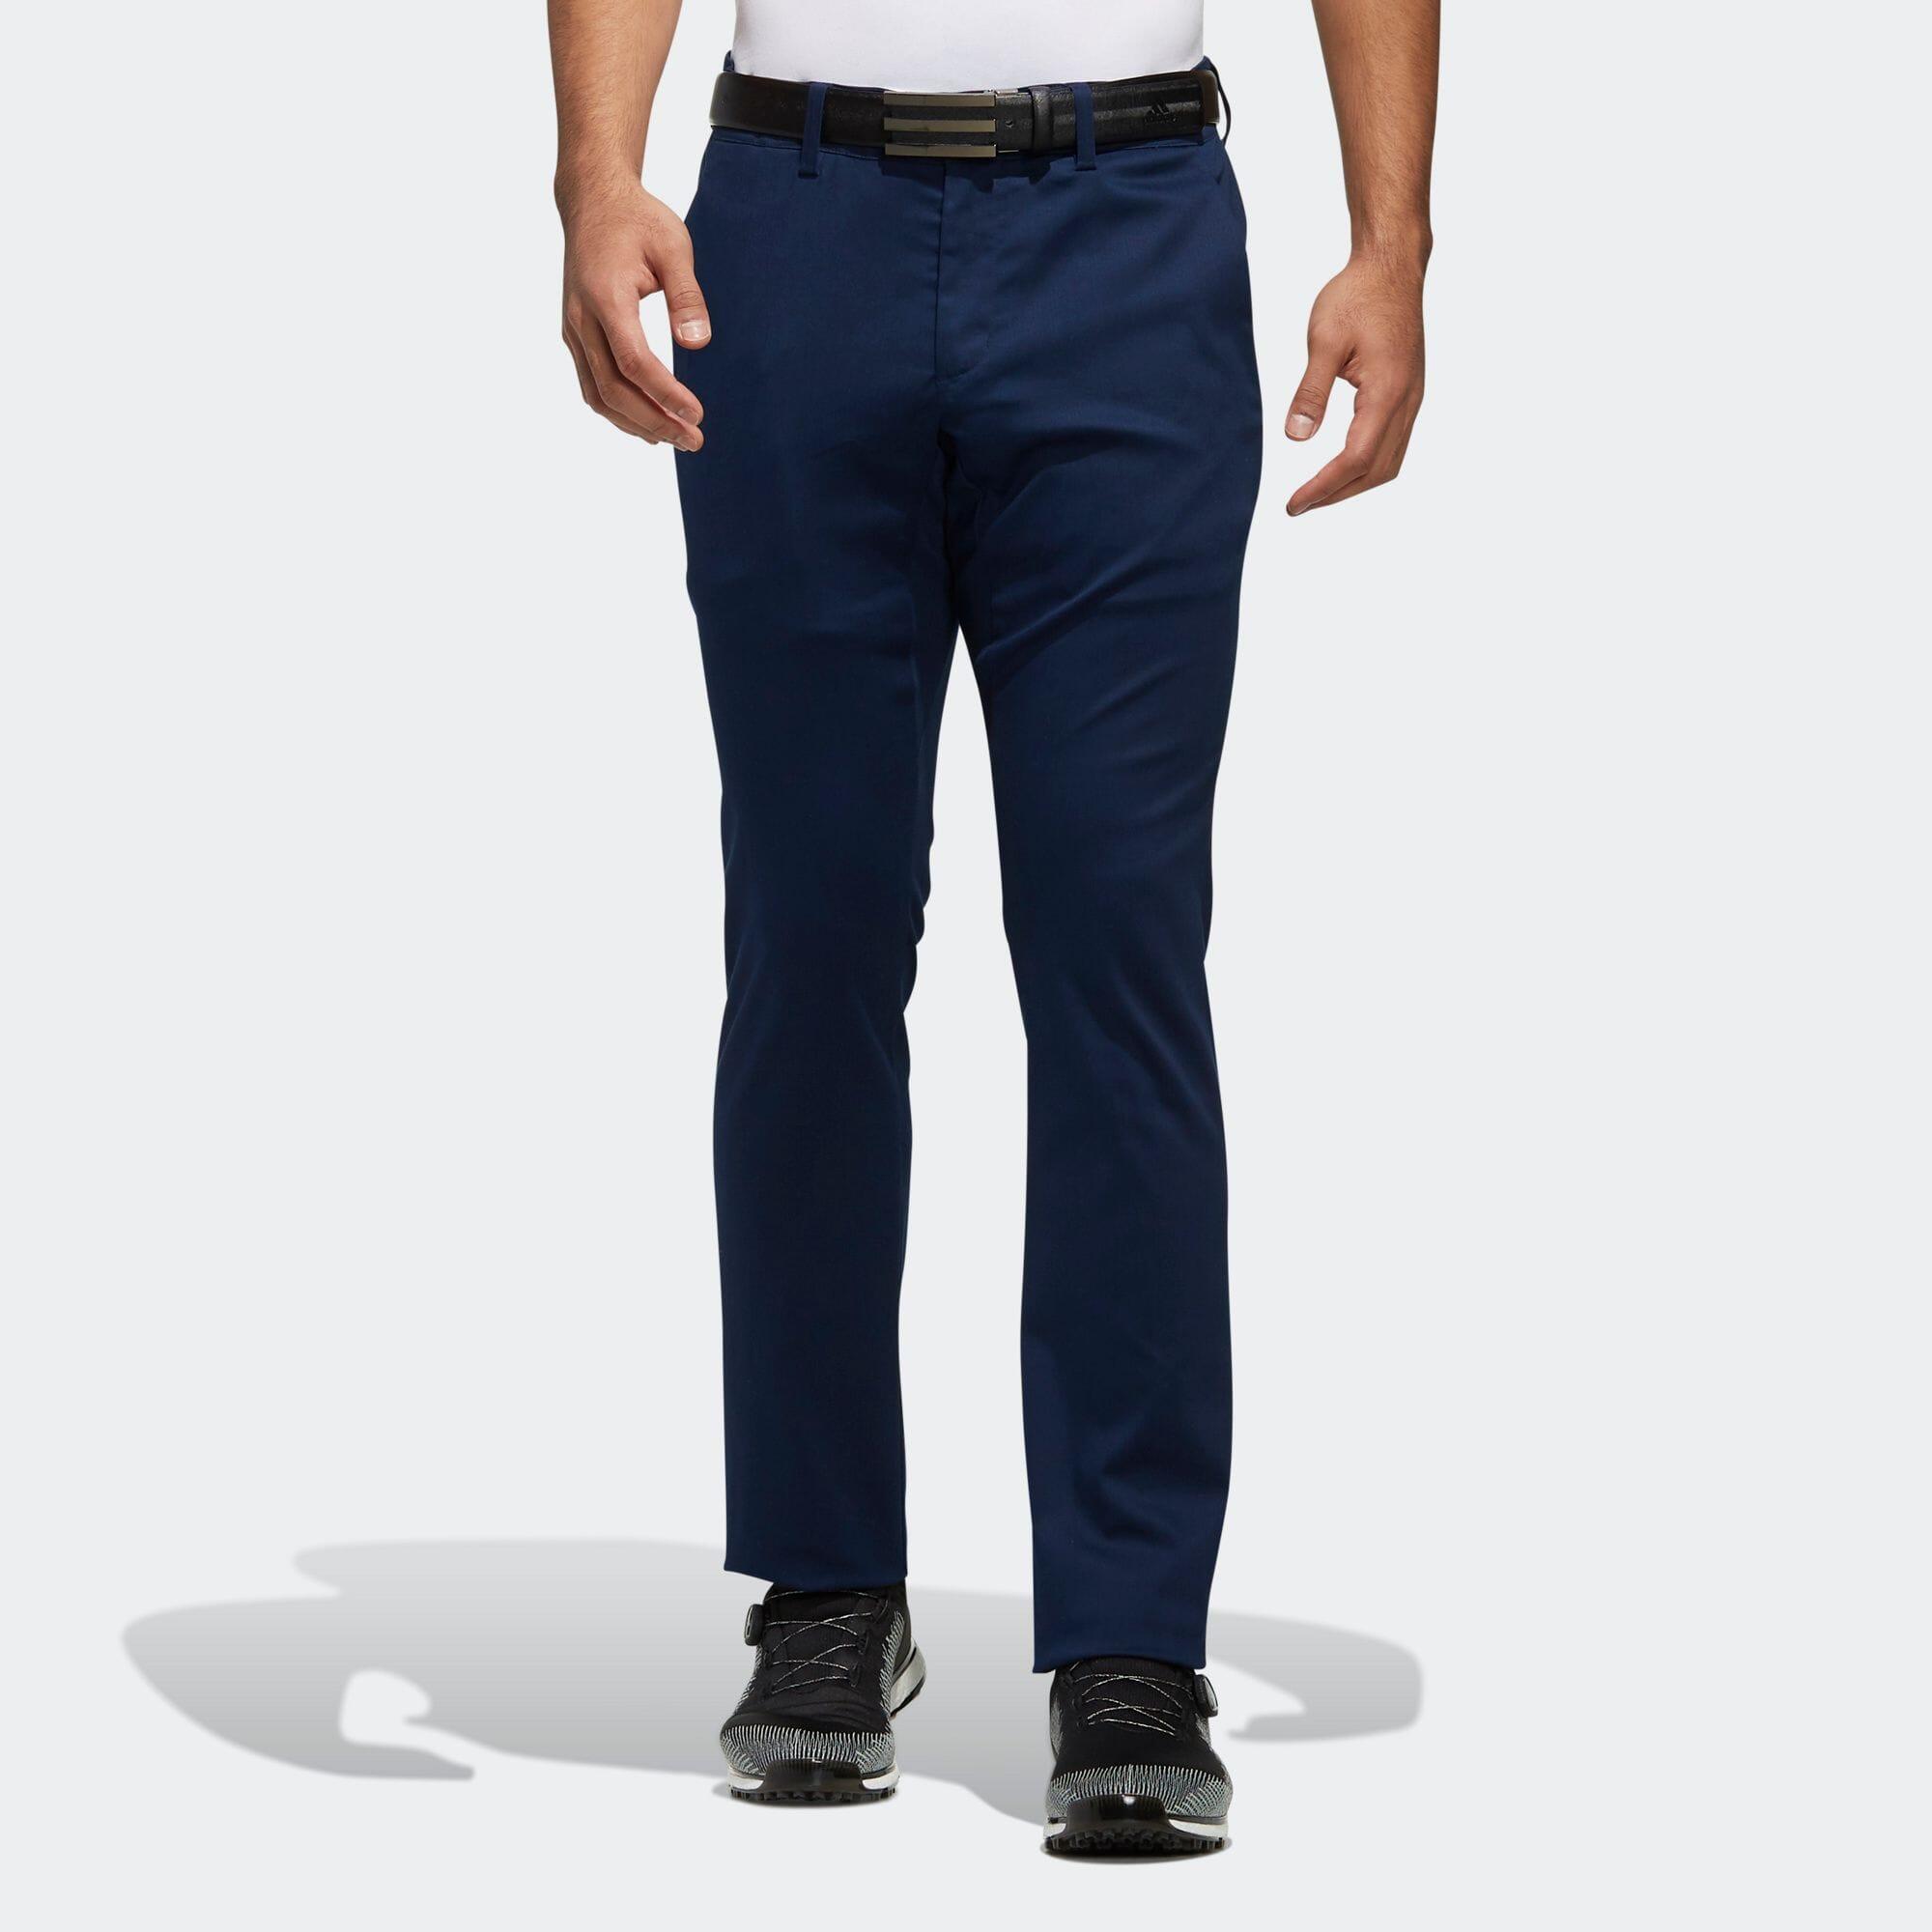 EX STRETCH ミニヘリンボーンパンツ / T/C Stretch Pants